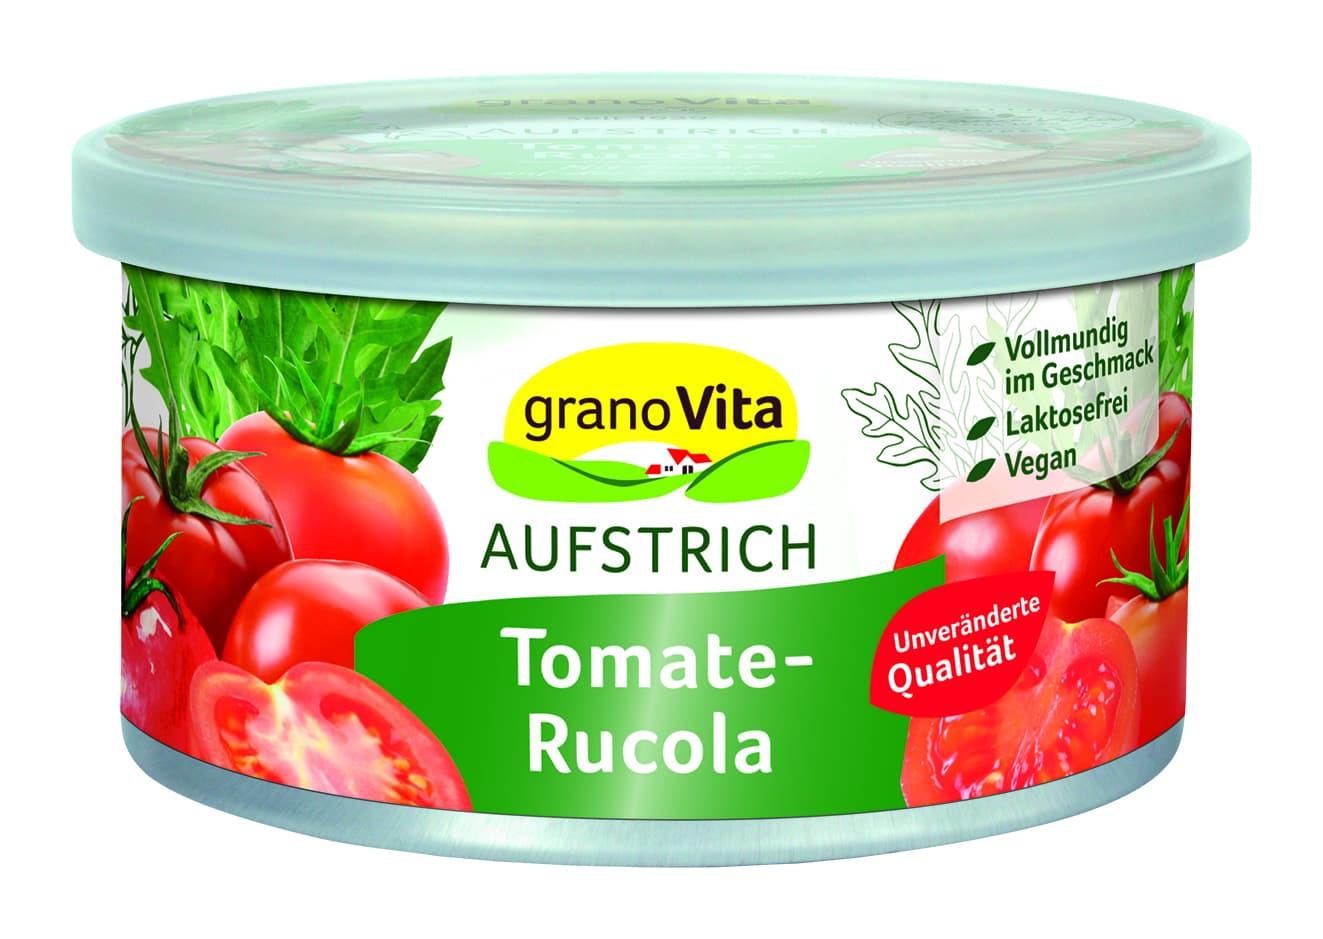 GranoVita - vegetarische Pastete Tomate Rucola 125g